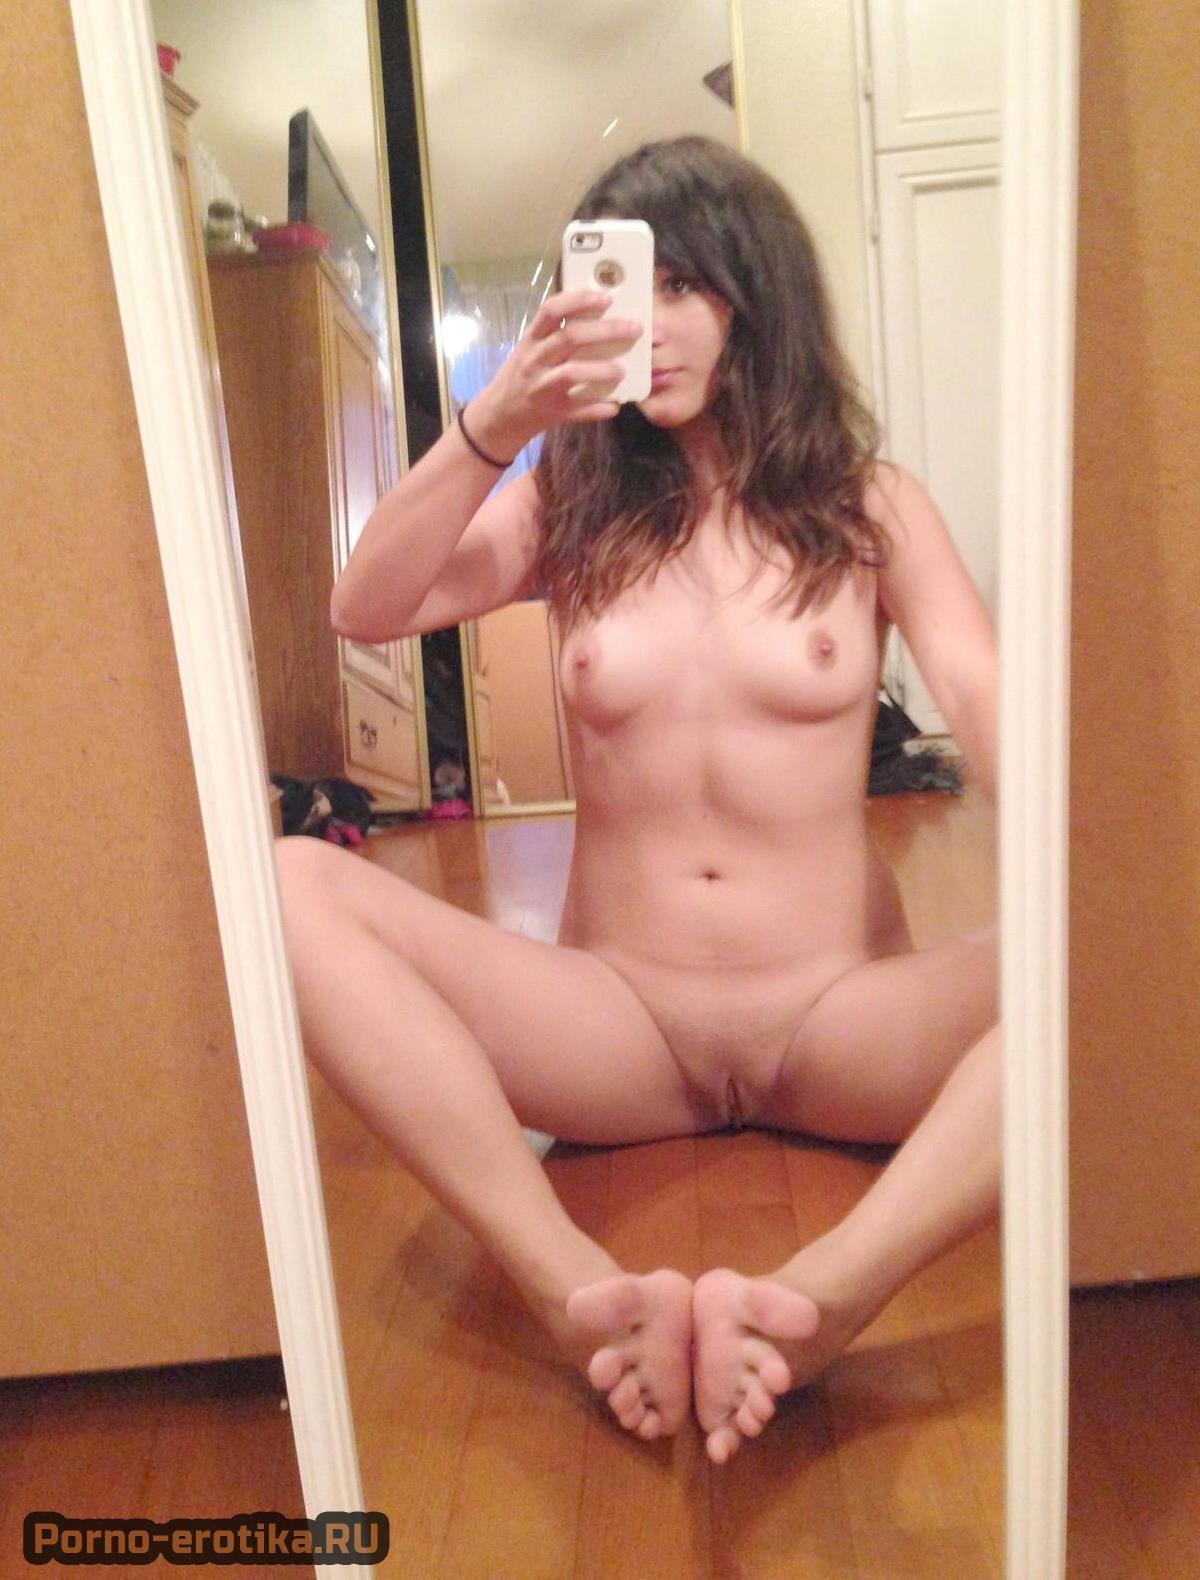 фото порно пышных зрелых жён